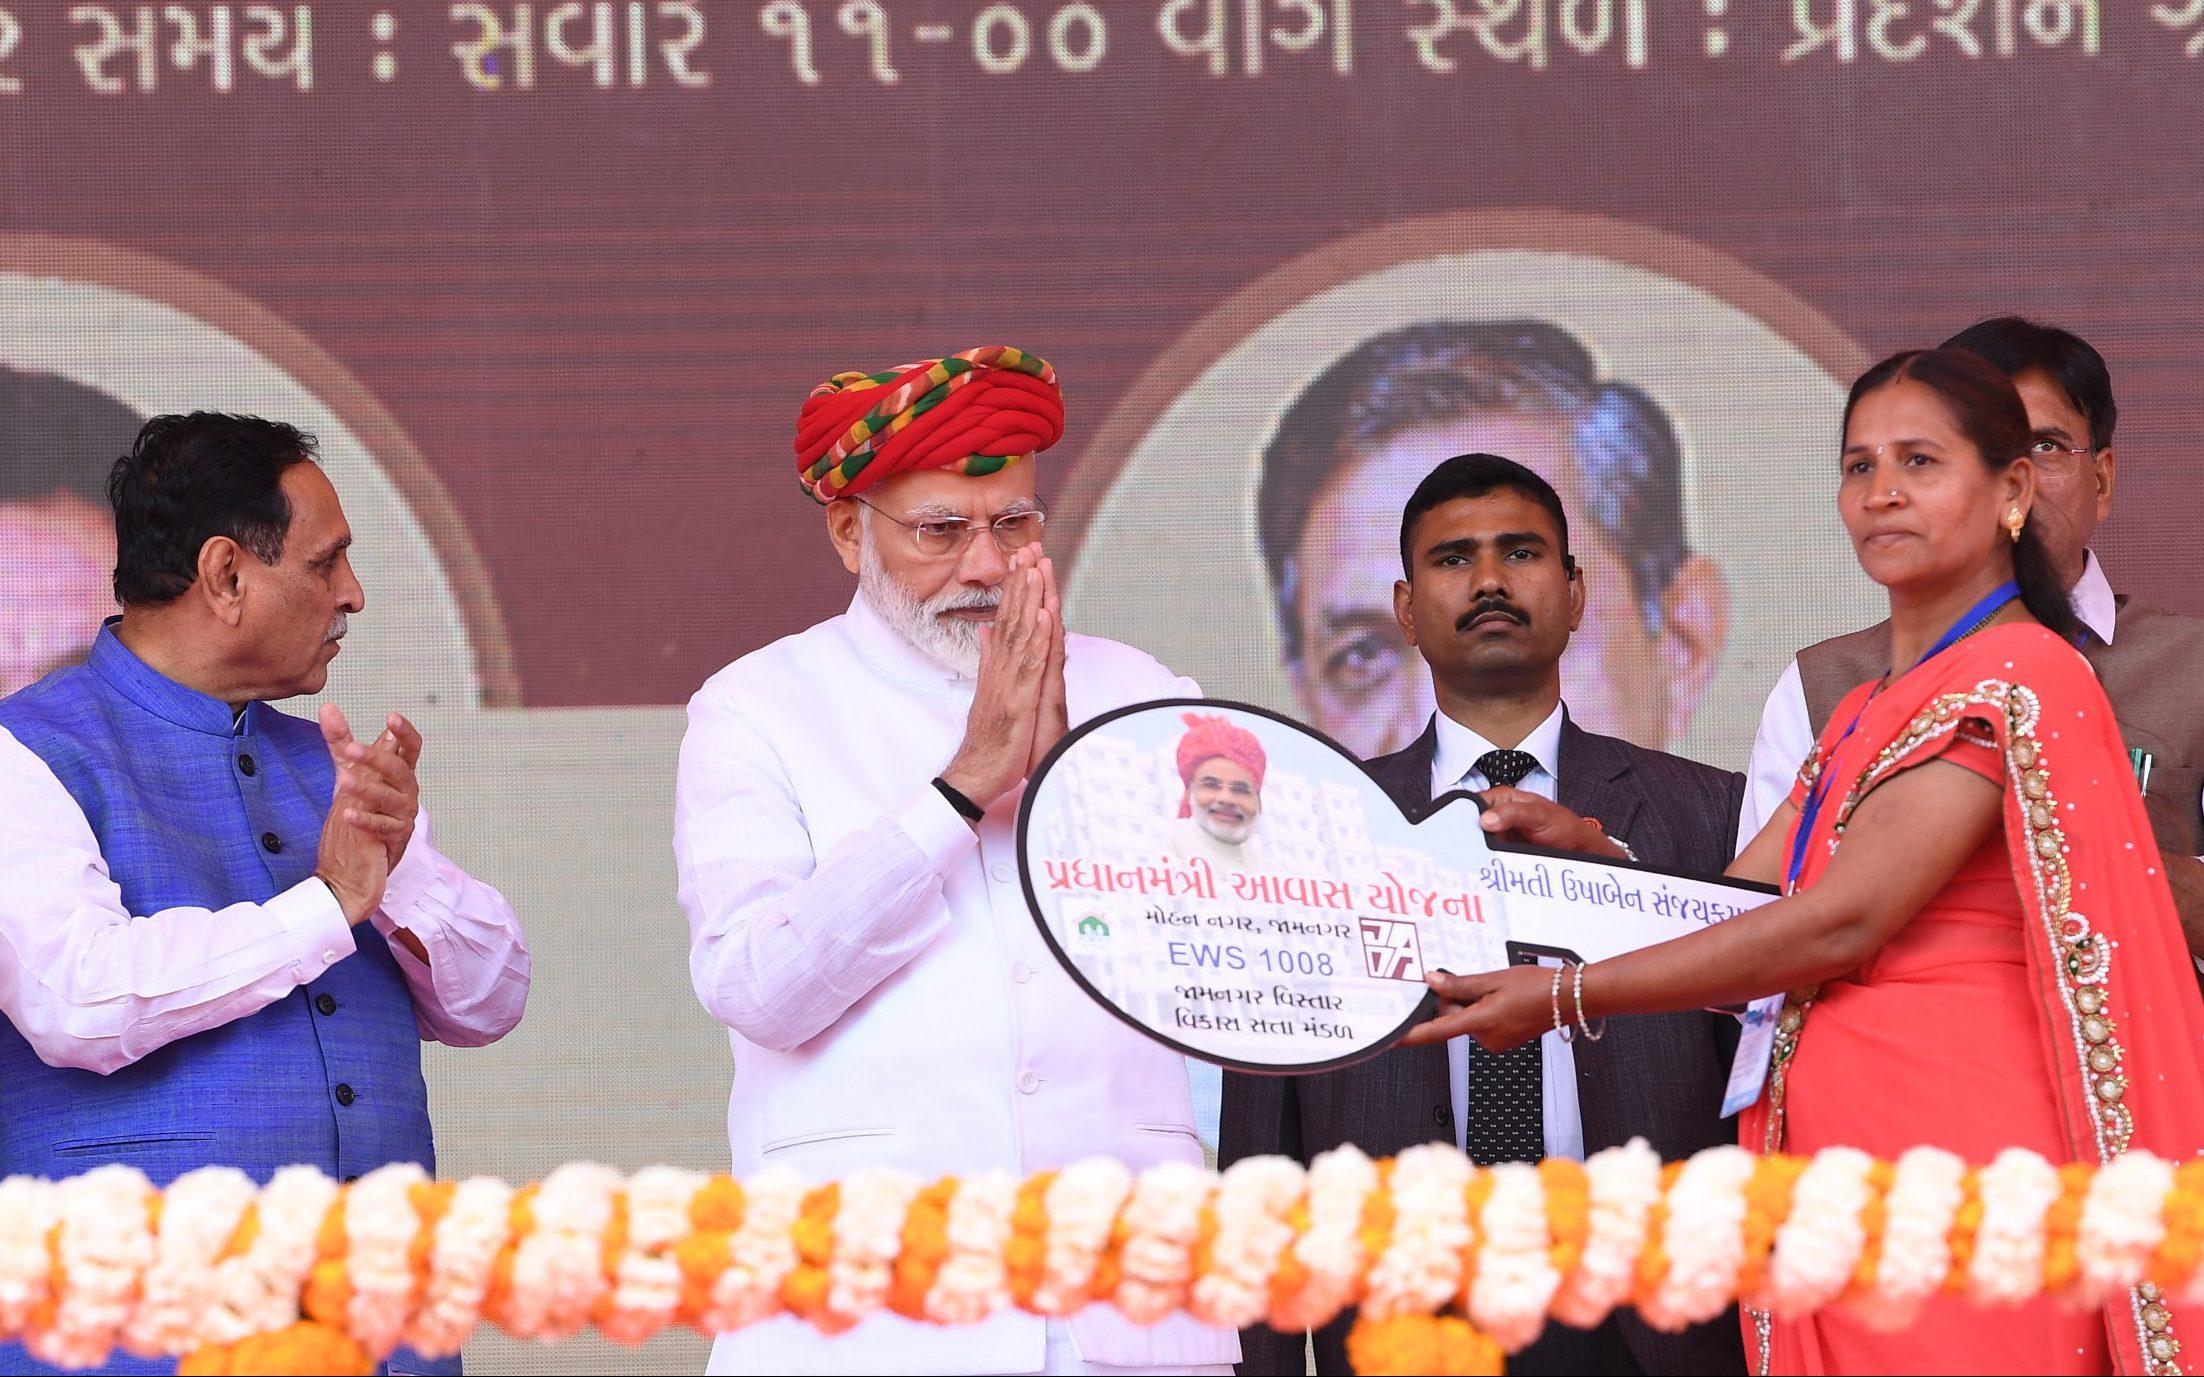 The Prime Minister, Shri Narendra Modi arrives at Jamnagar, Gujarat on March 04, 2019.